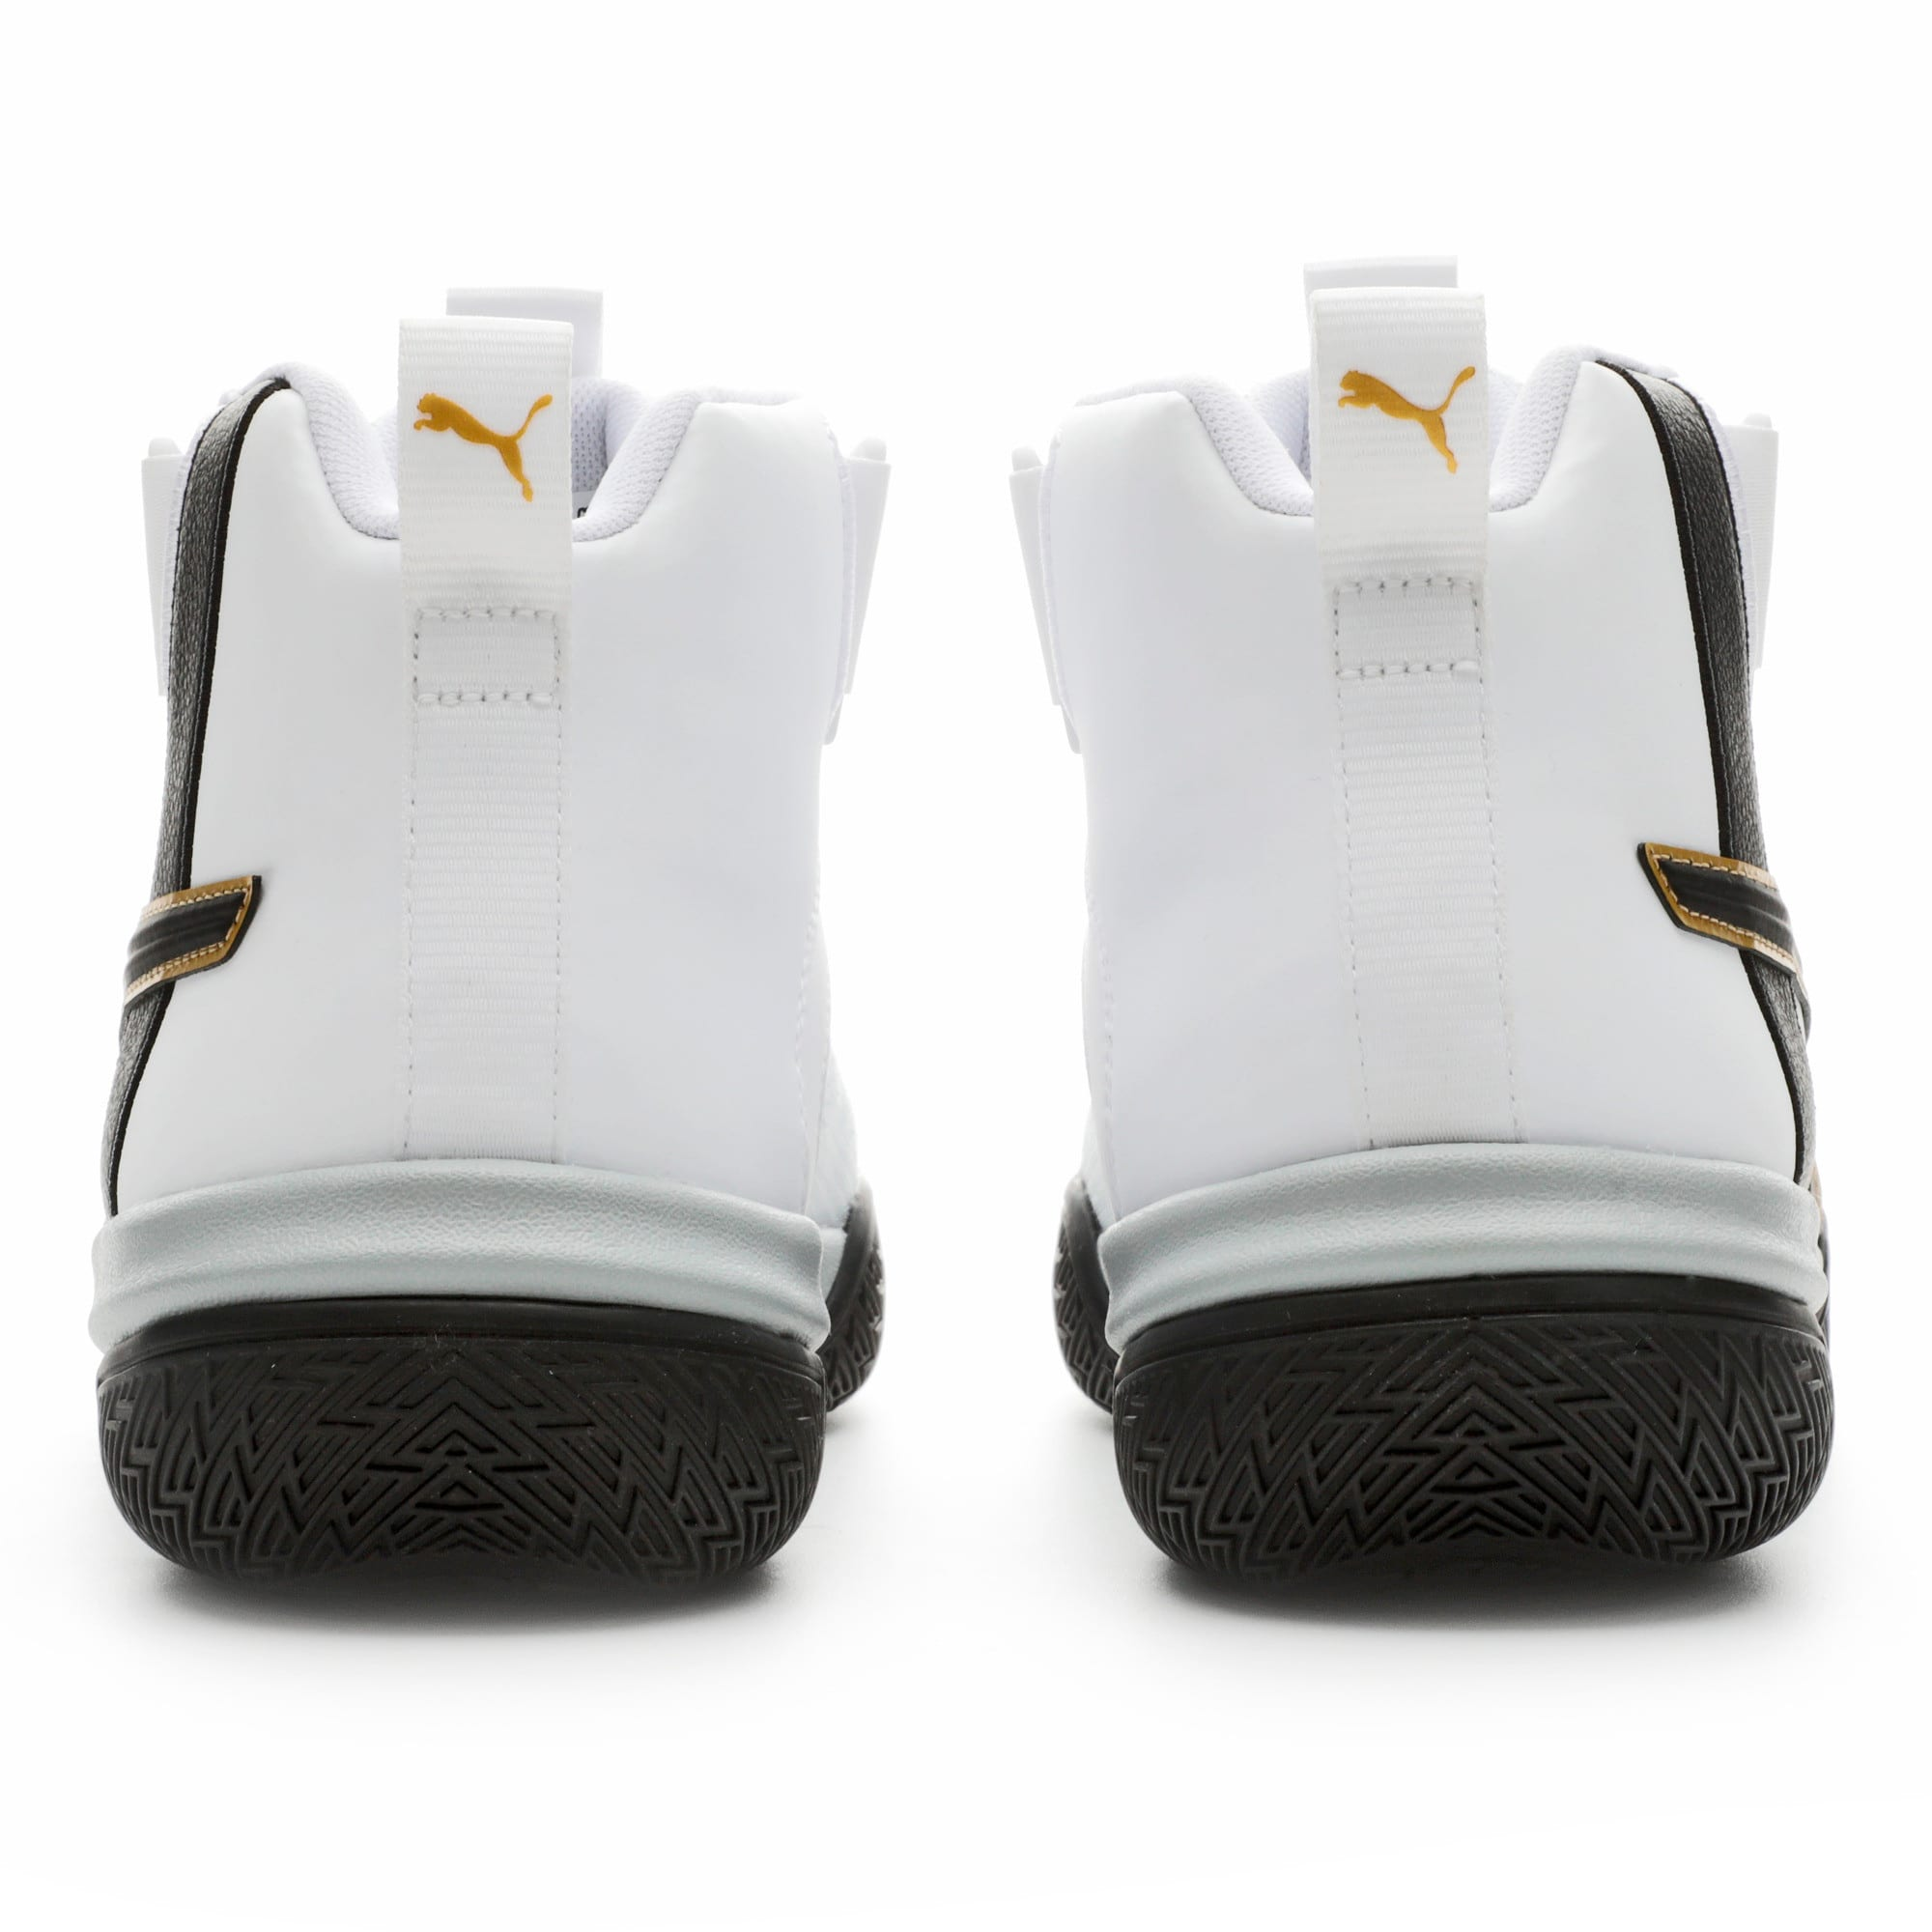 Thumbnail 3 of Legacy '68 Basketball Shoes, Puma Black-Puma White, medium-IND